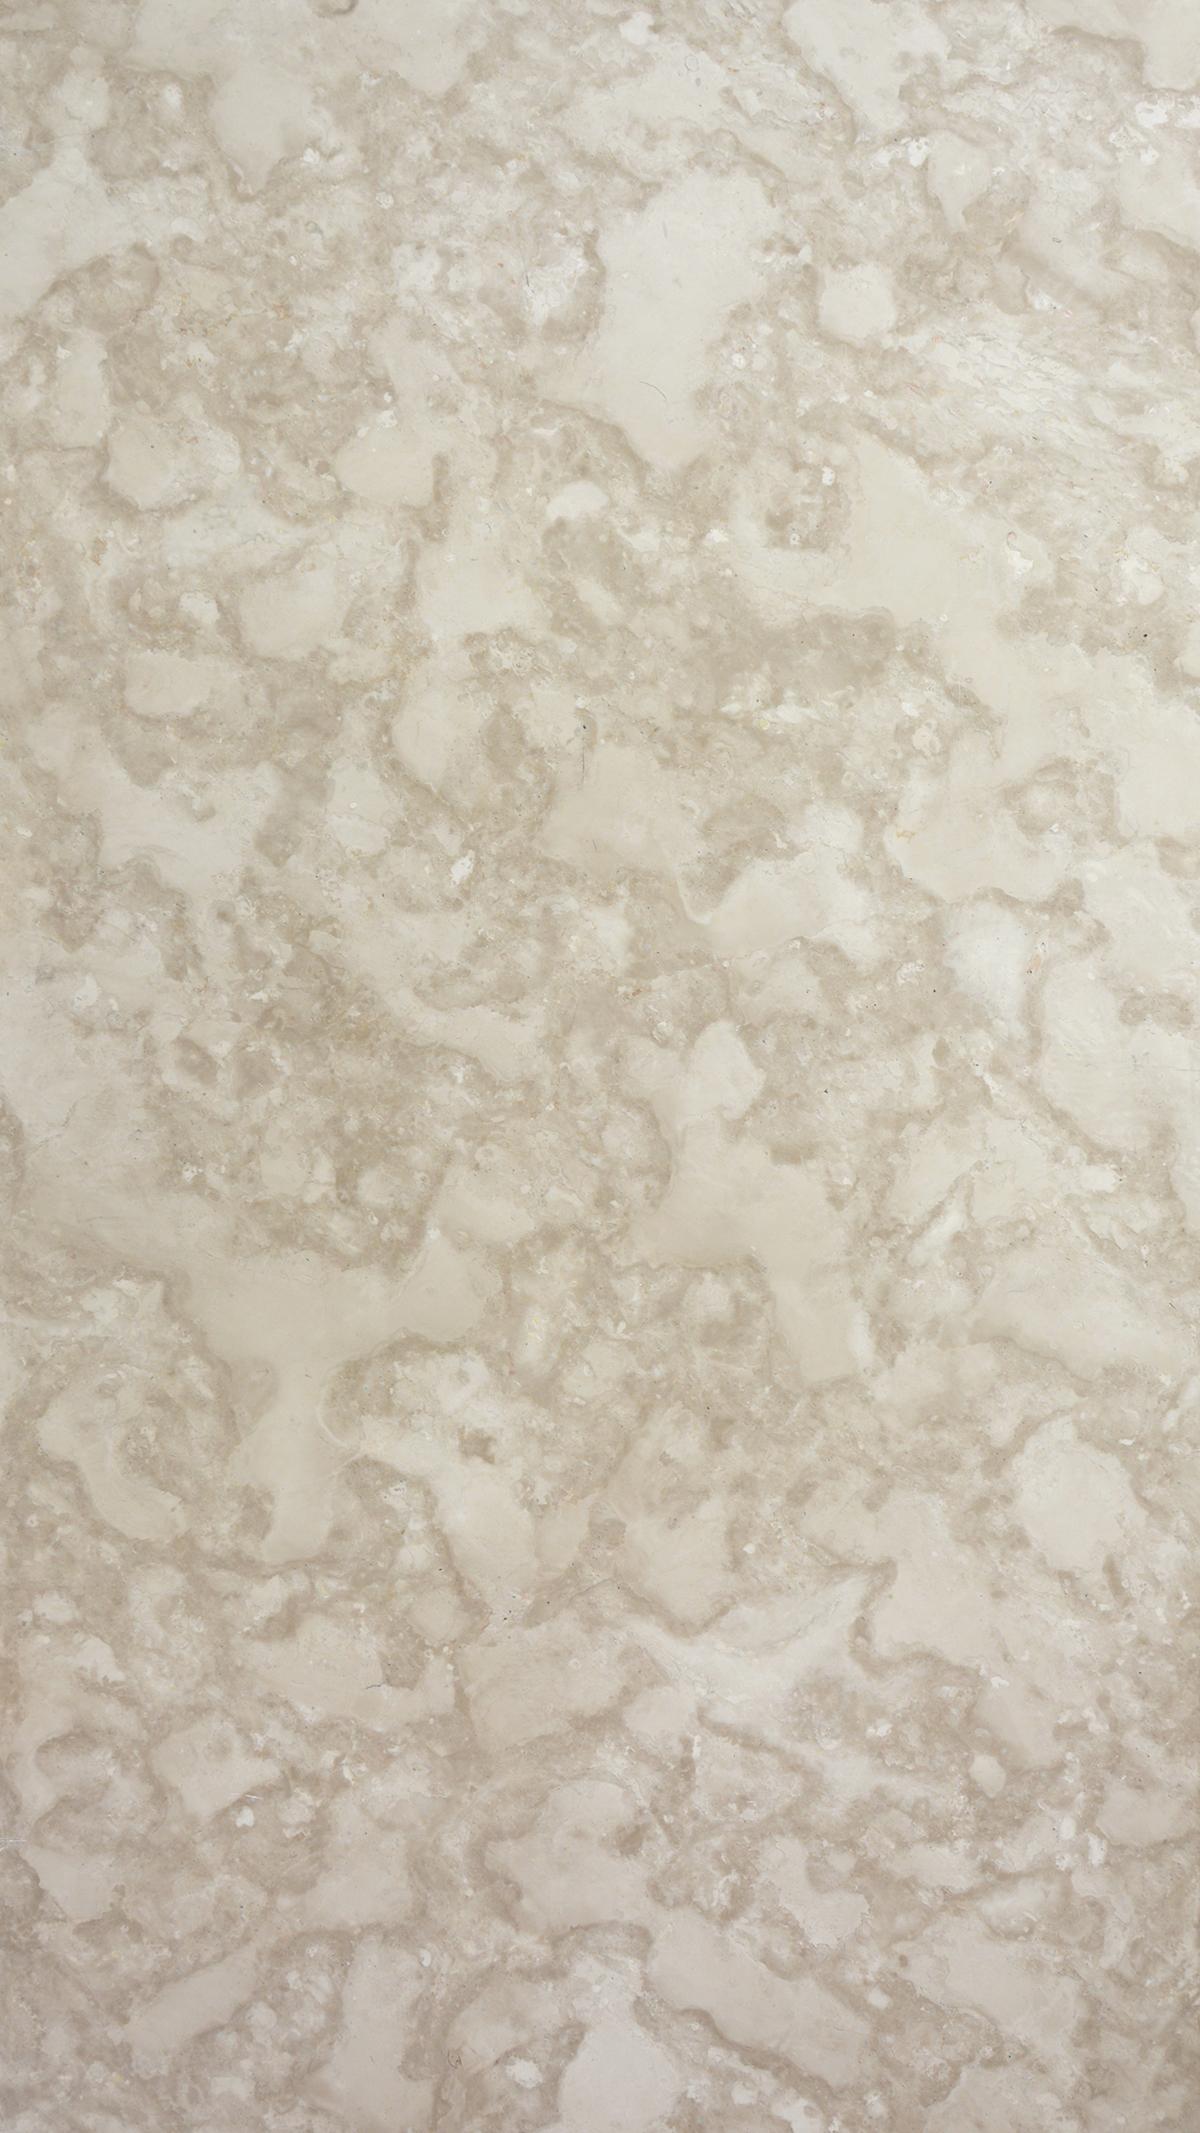 Crema Egadi Marble